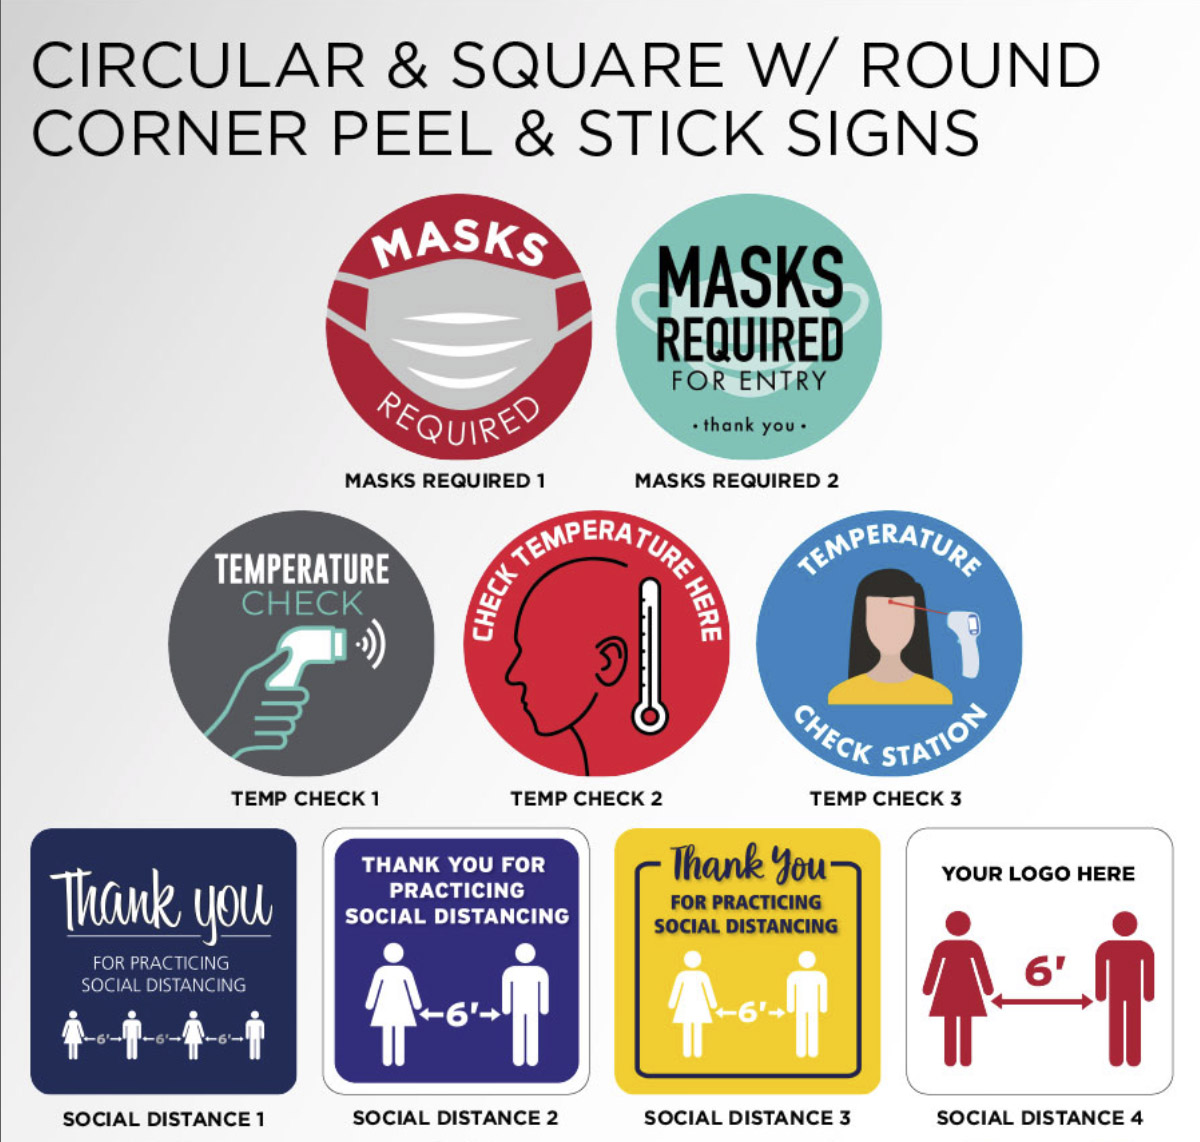 circular-square-w-round-corner-peel-stick-signs.jpg